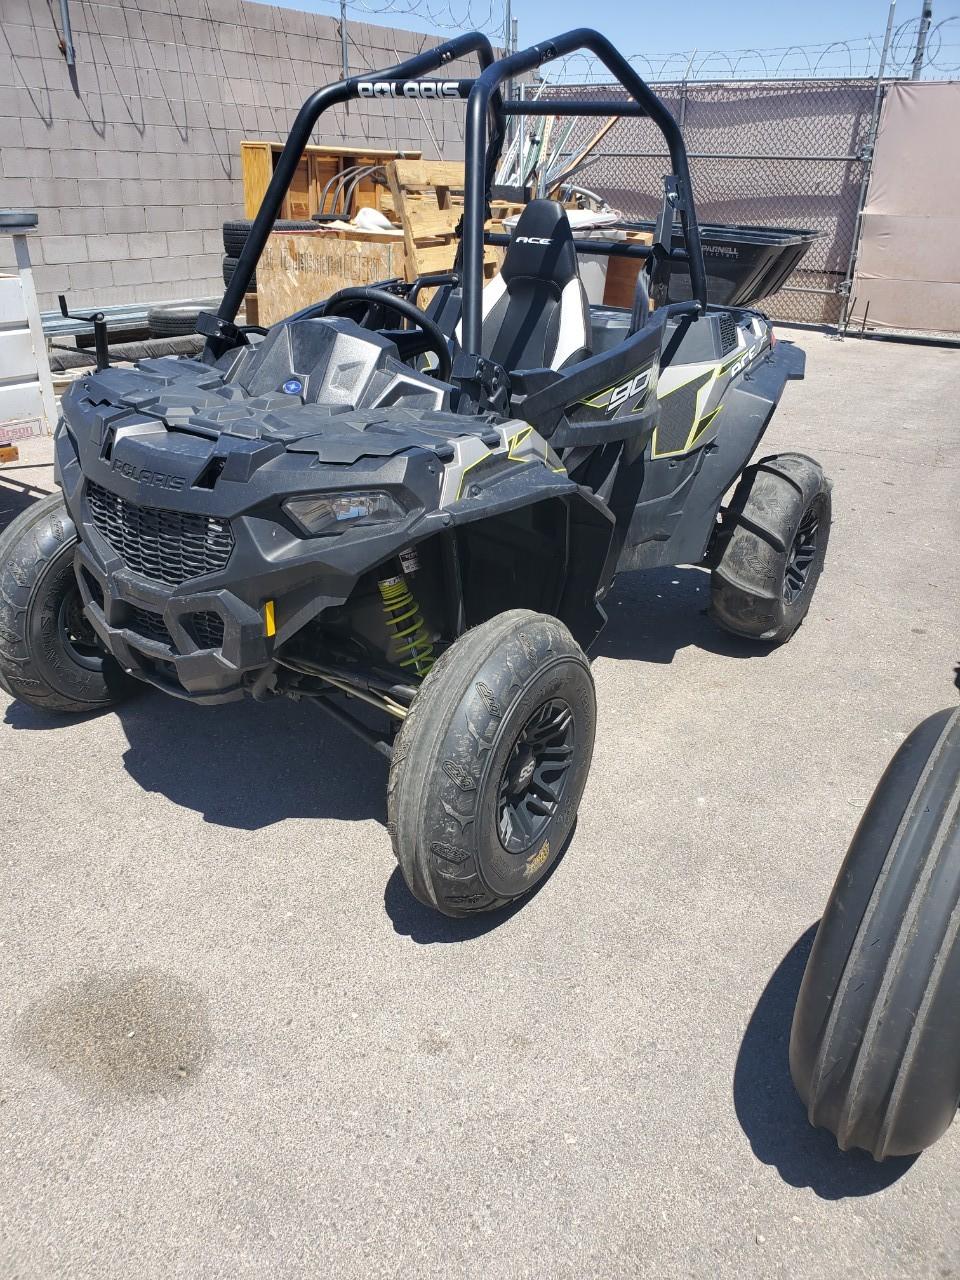 Used Sport,2000774 ATVs For Sale - ATV Trader